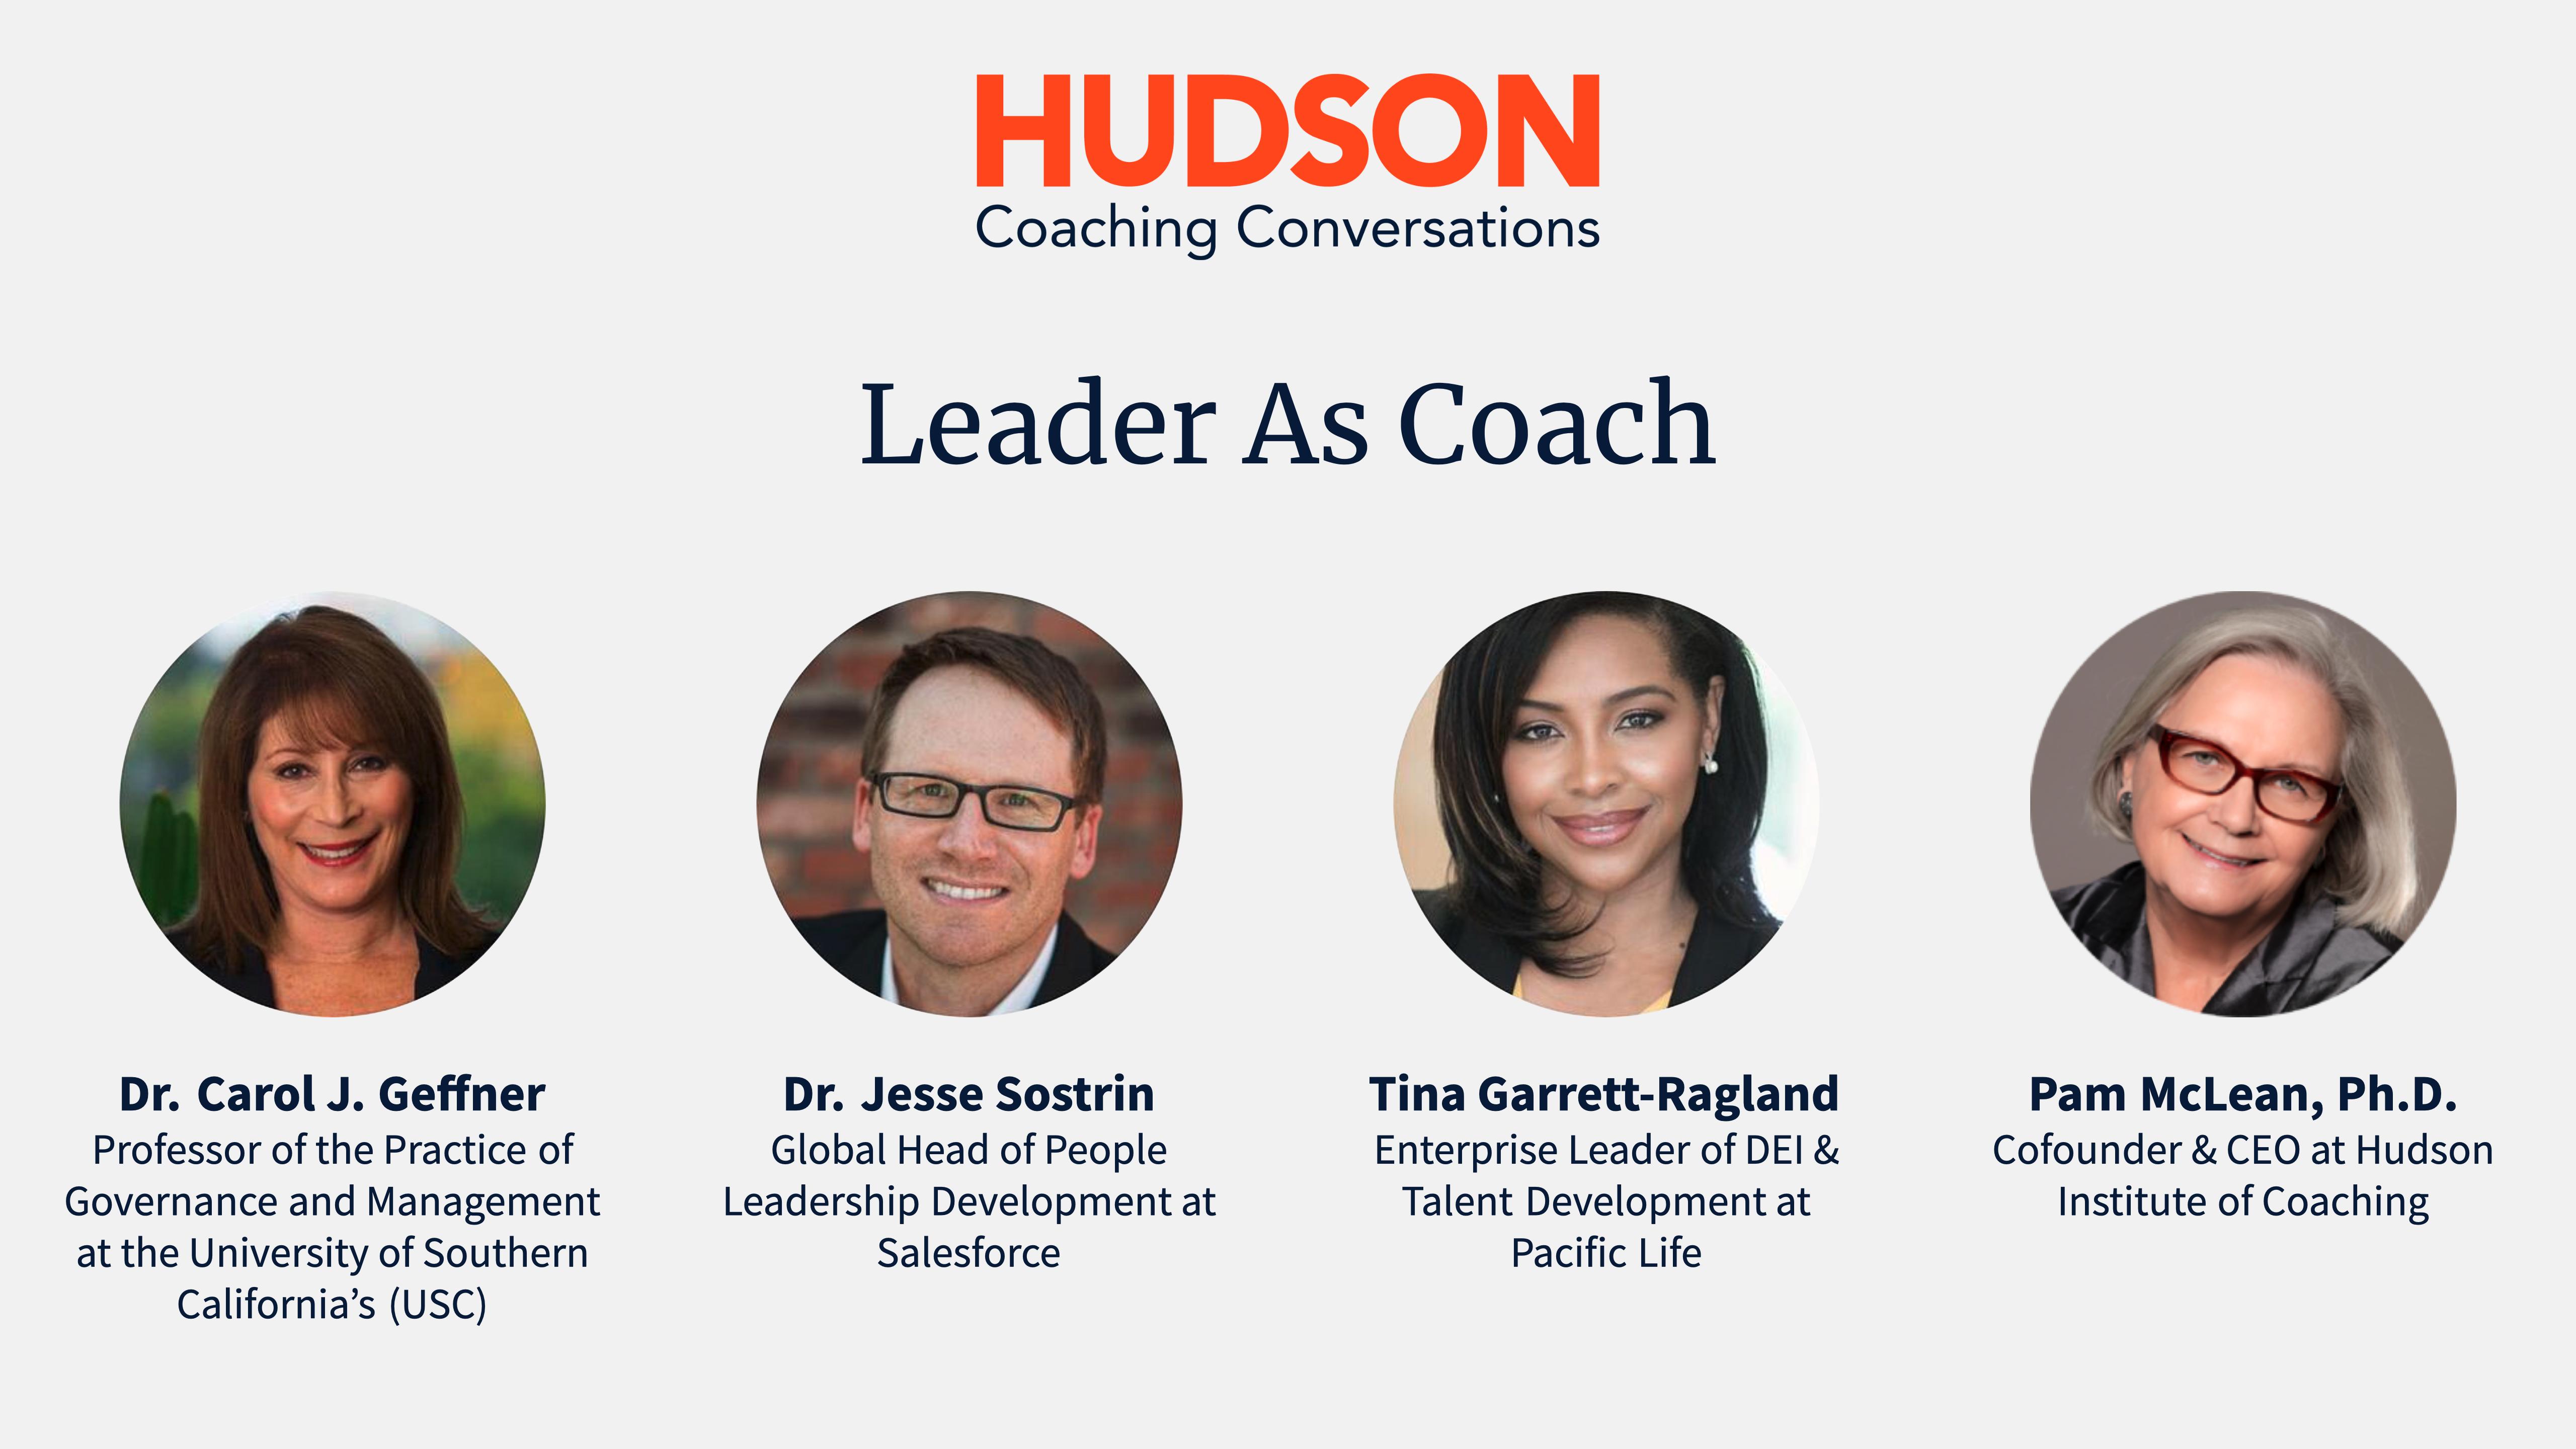 [Video] Hudson Coaching Conversations: Leader As Coach